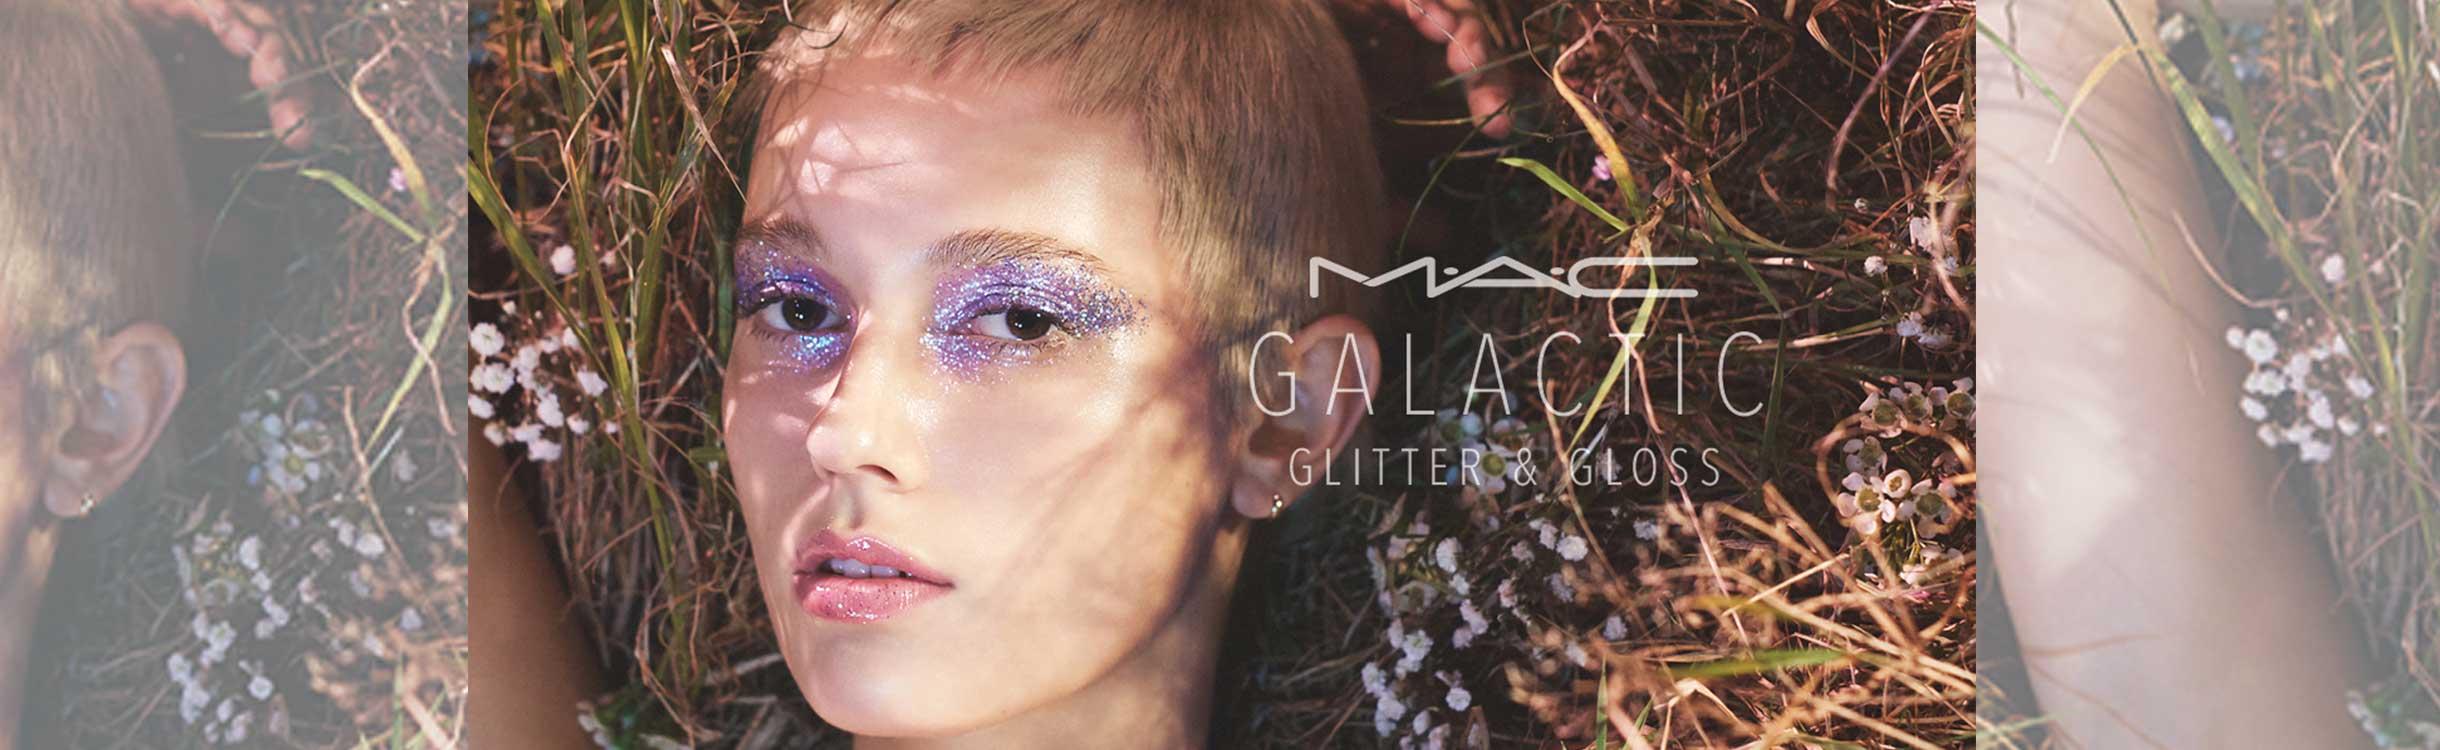 M·A·C Galactic